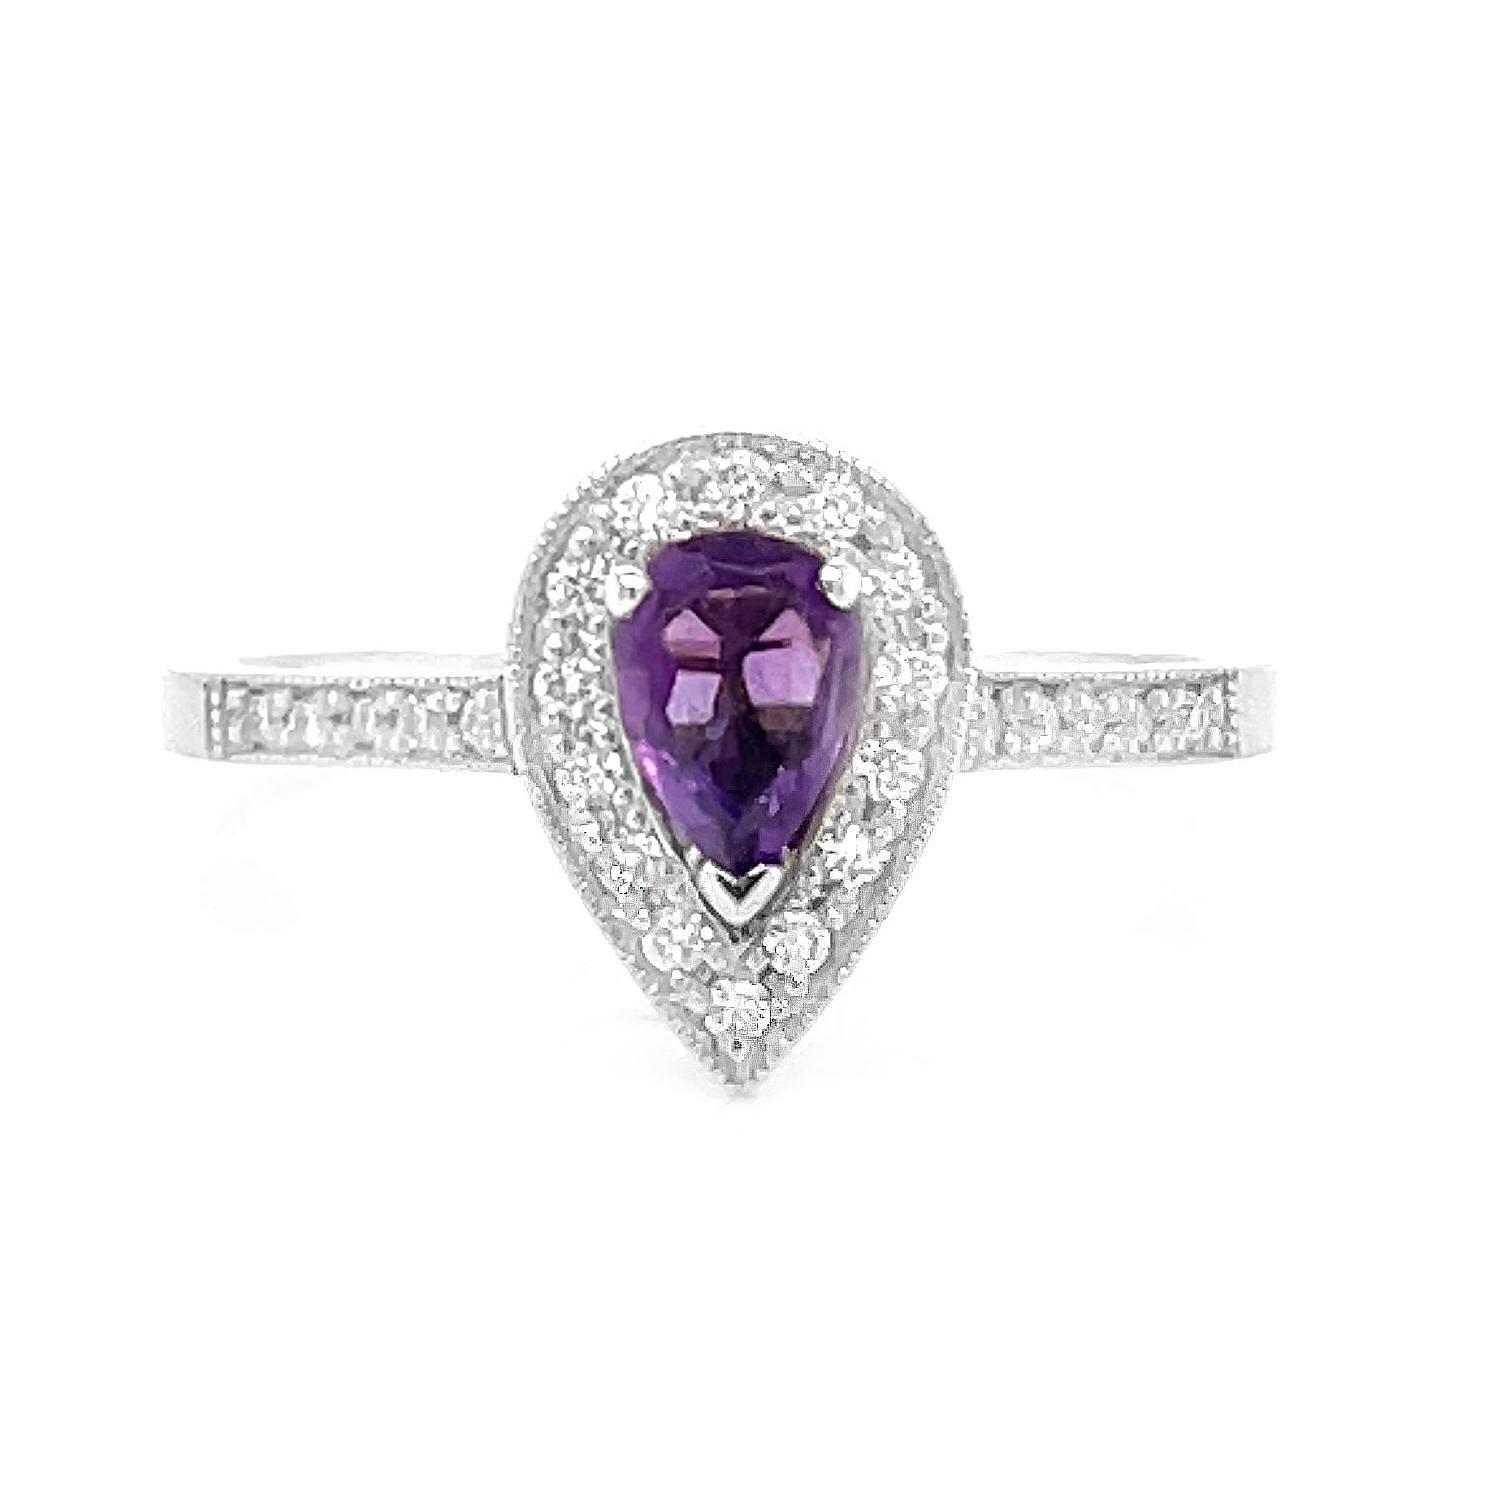 9k White Gold Pearshape Amethyst & Brilliant Cut Diamond Cluster Ring